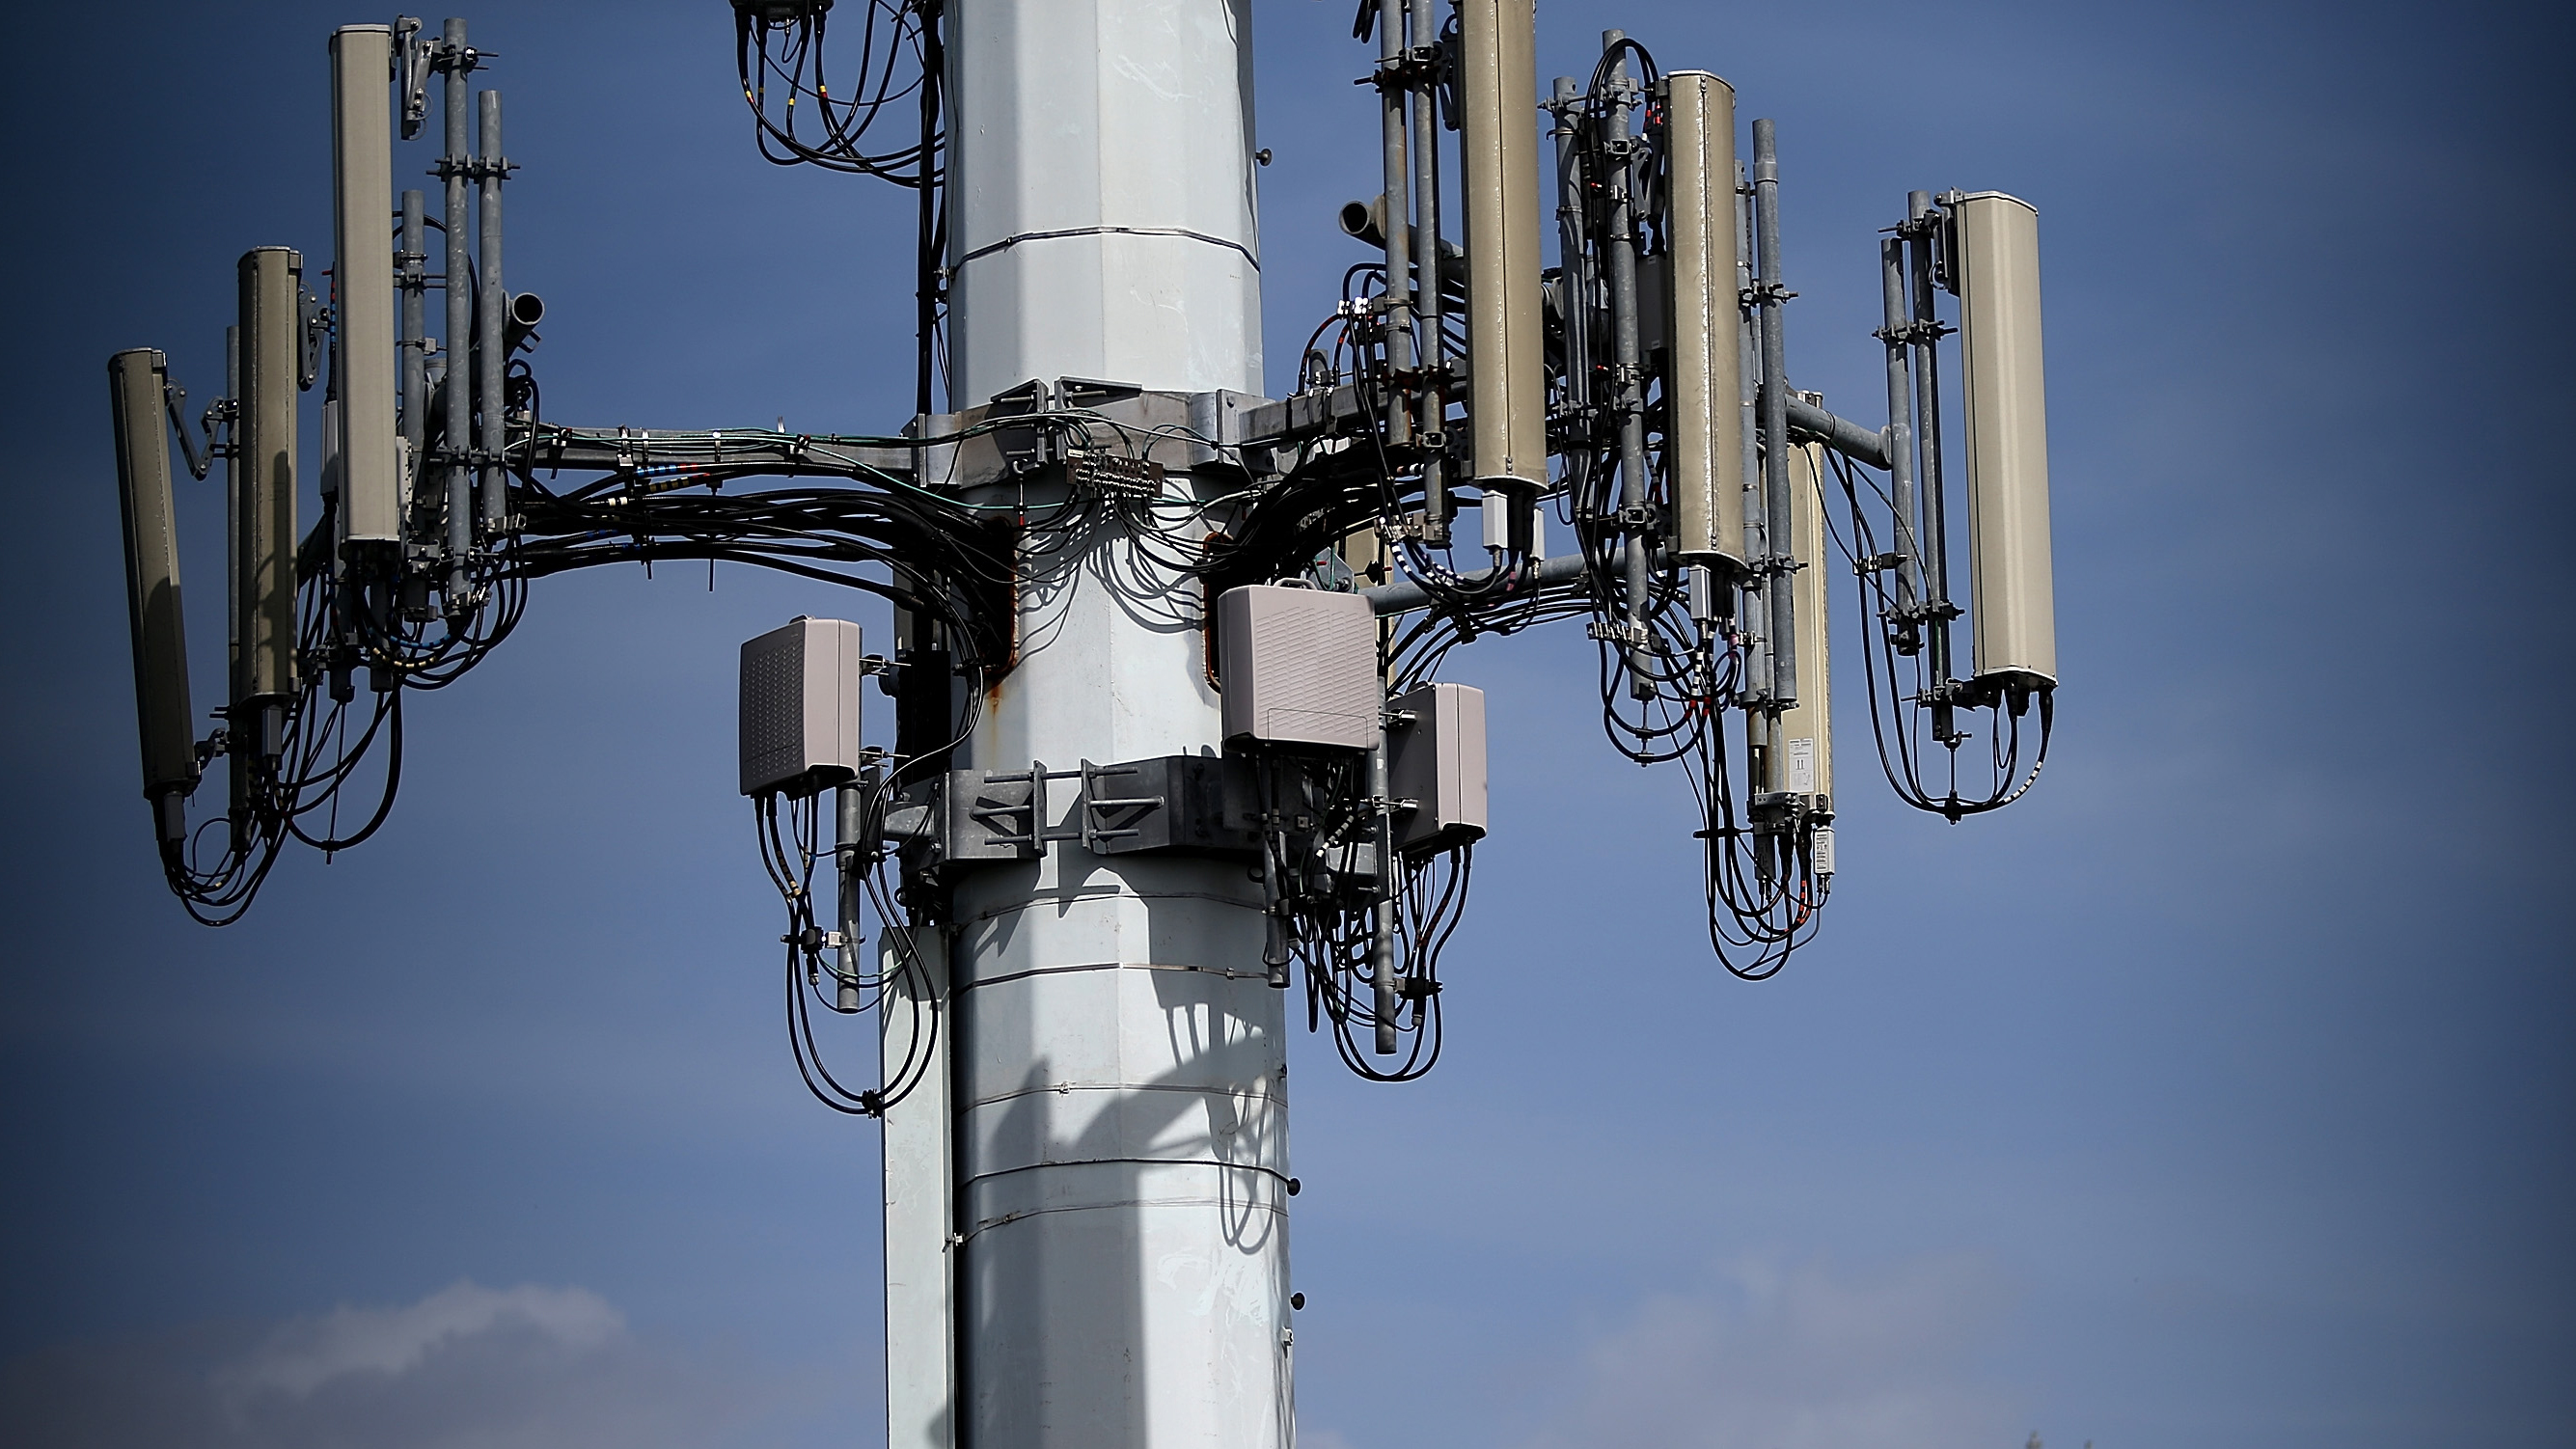 Bounty hunters tracked people secretly using US phone giants' location data